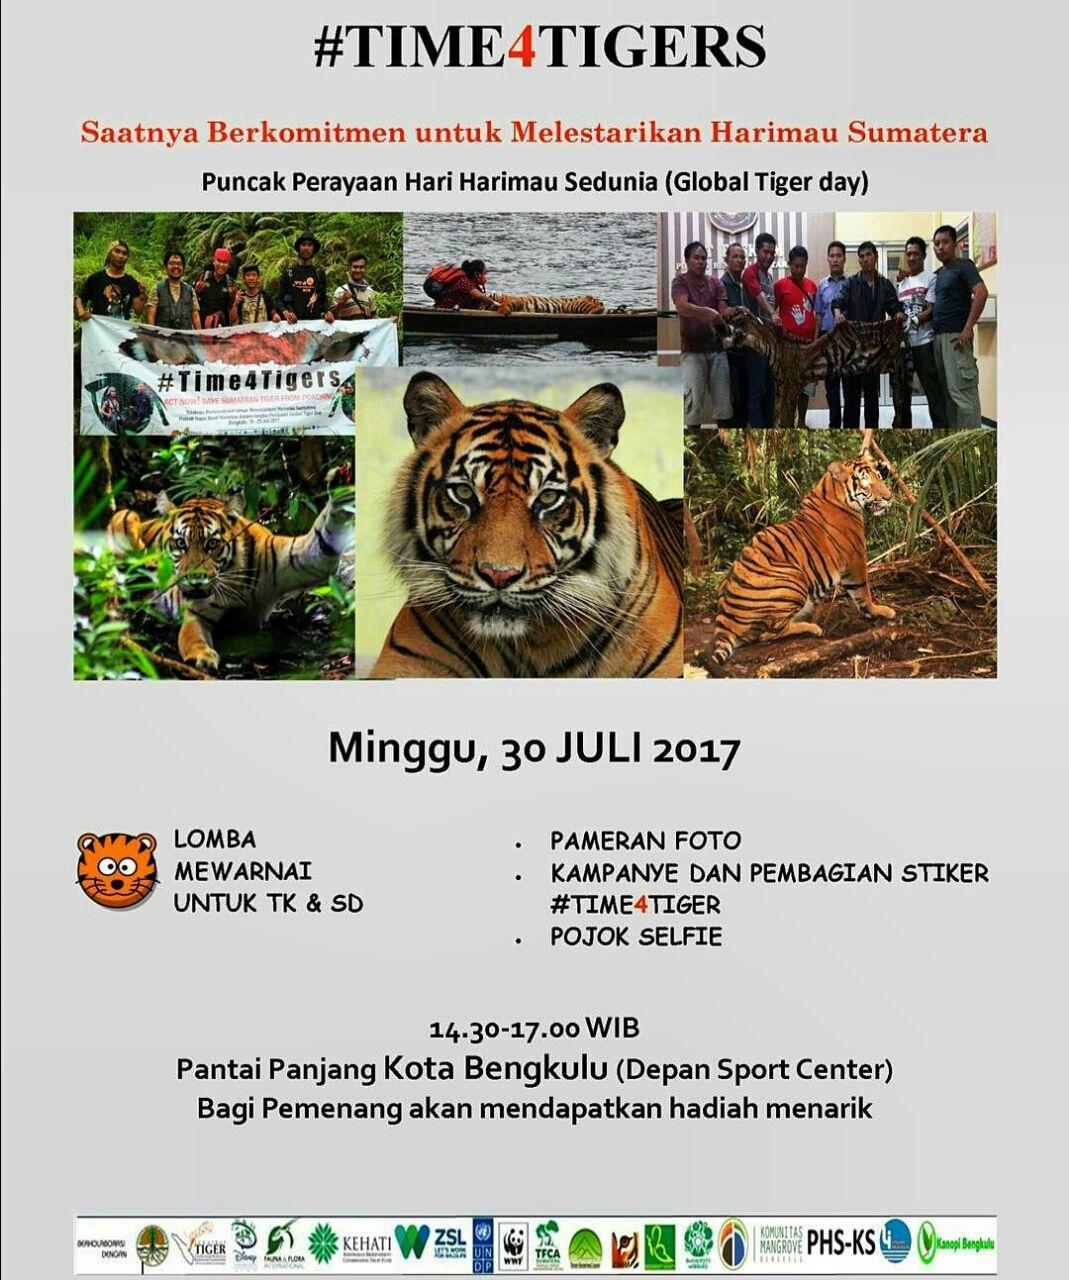 Puncak Perayaan Hari Harimau Sedunia